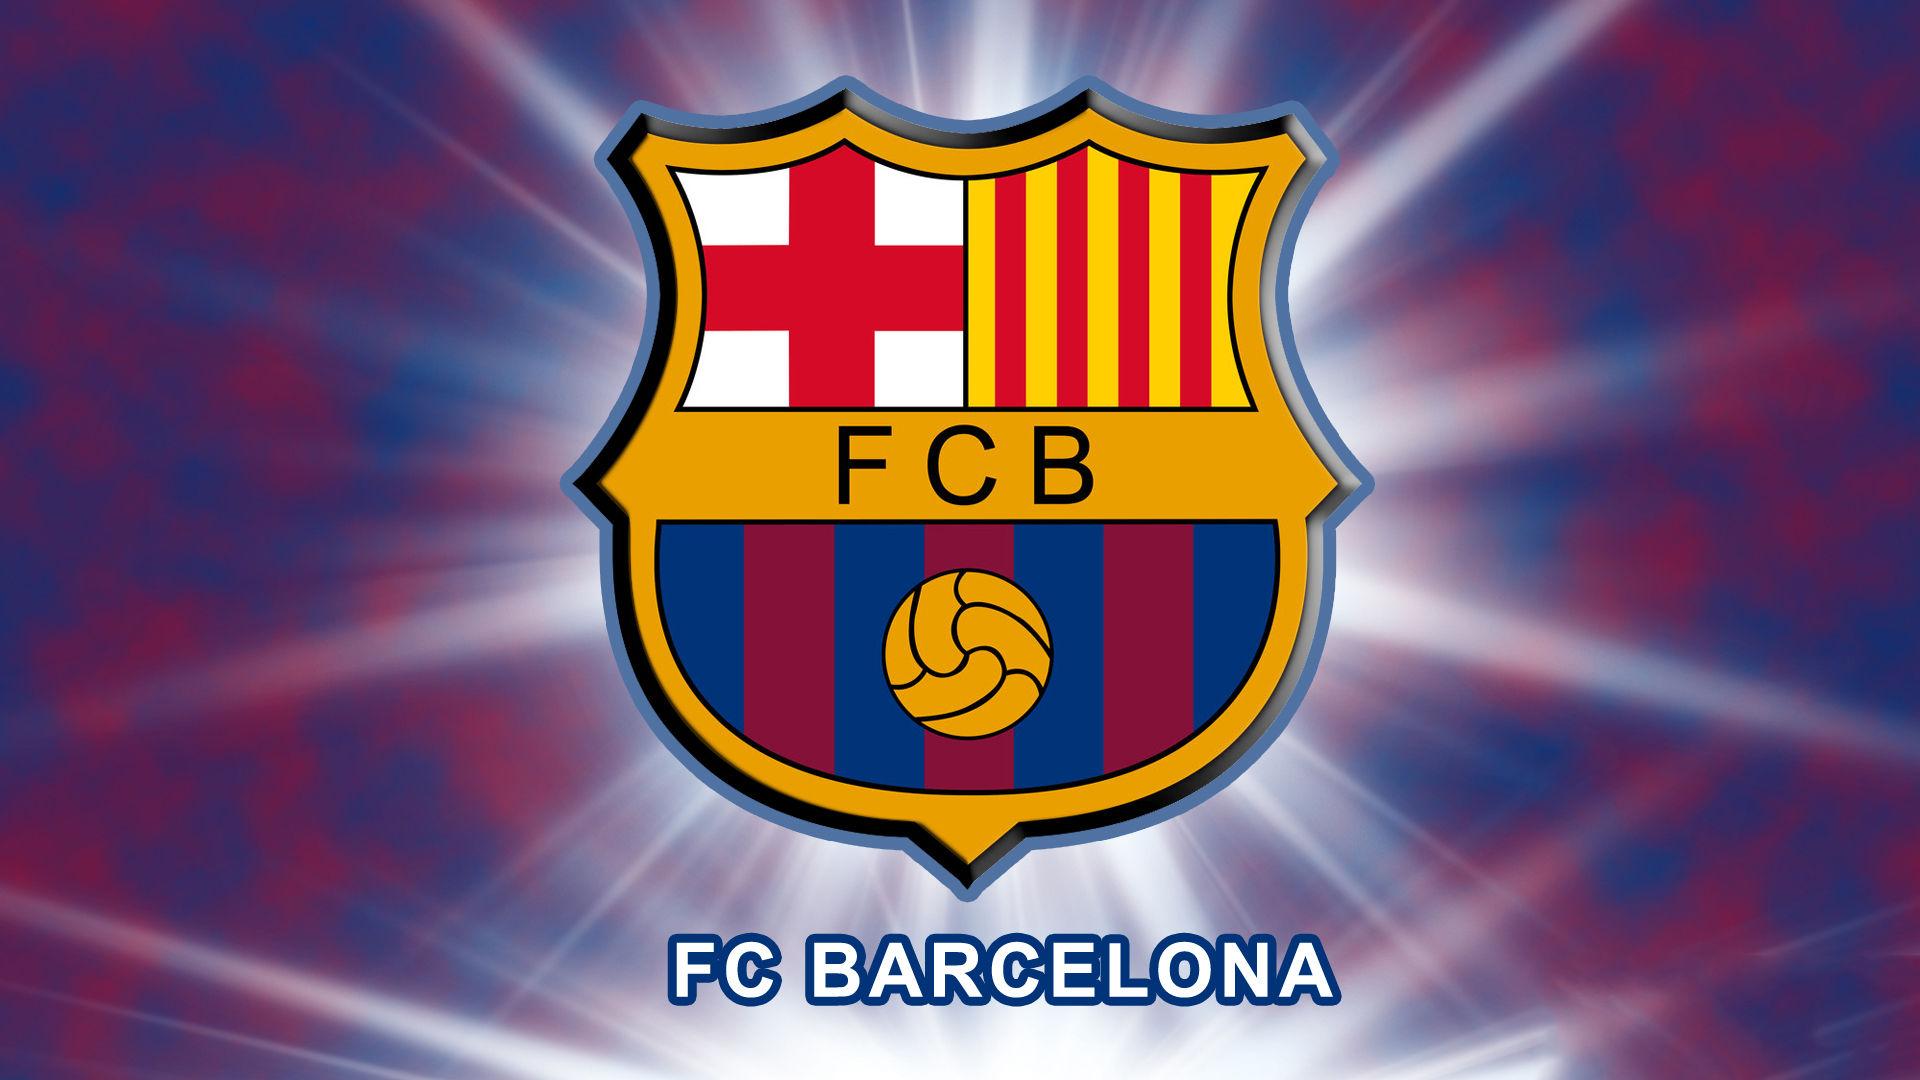 Fonds d'écran Fc Barcelone Logo - MaximumWall